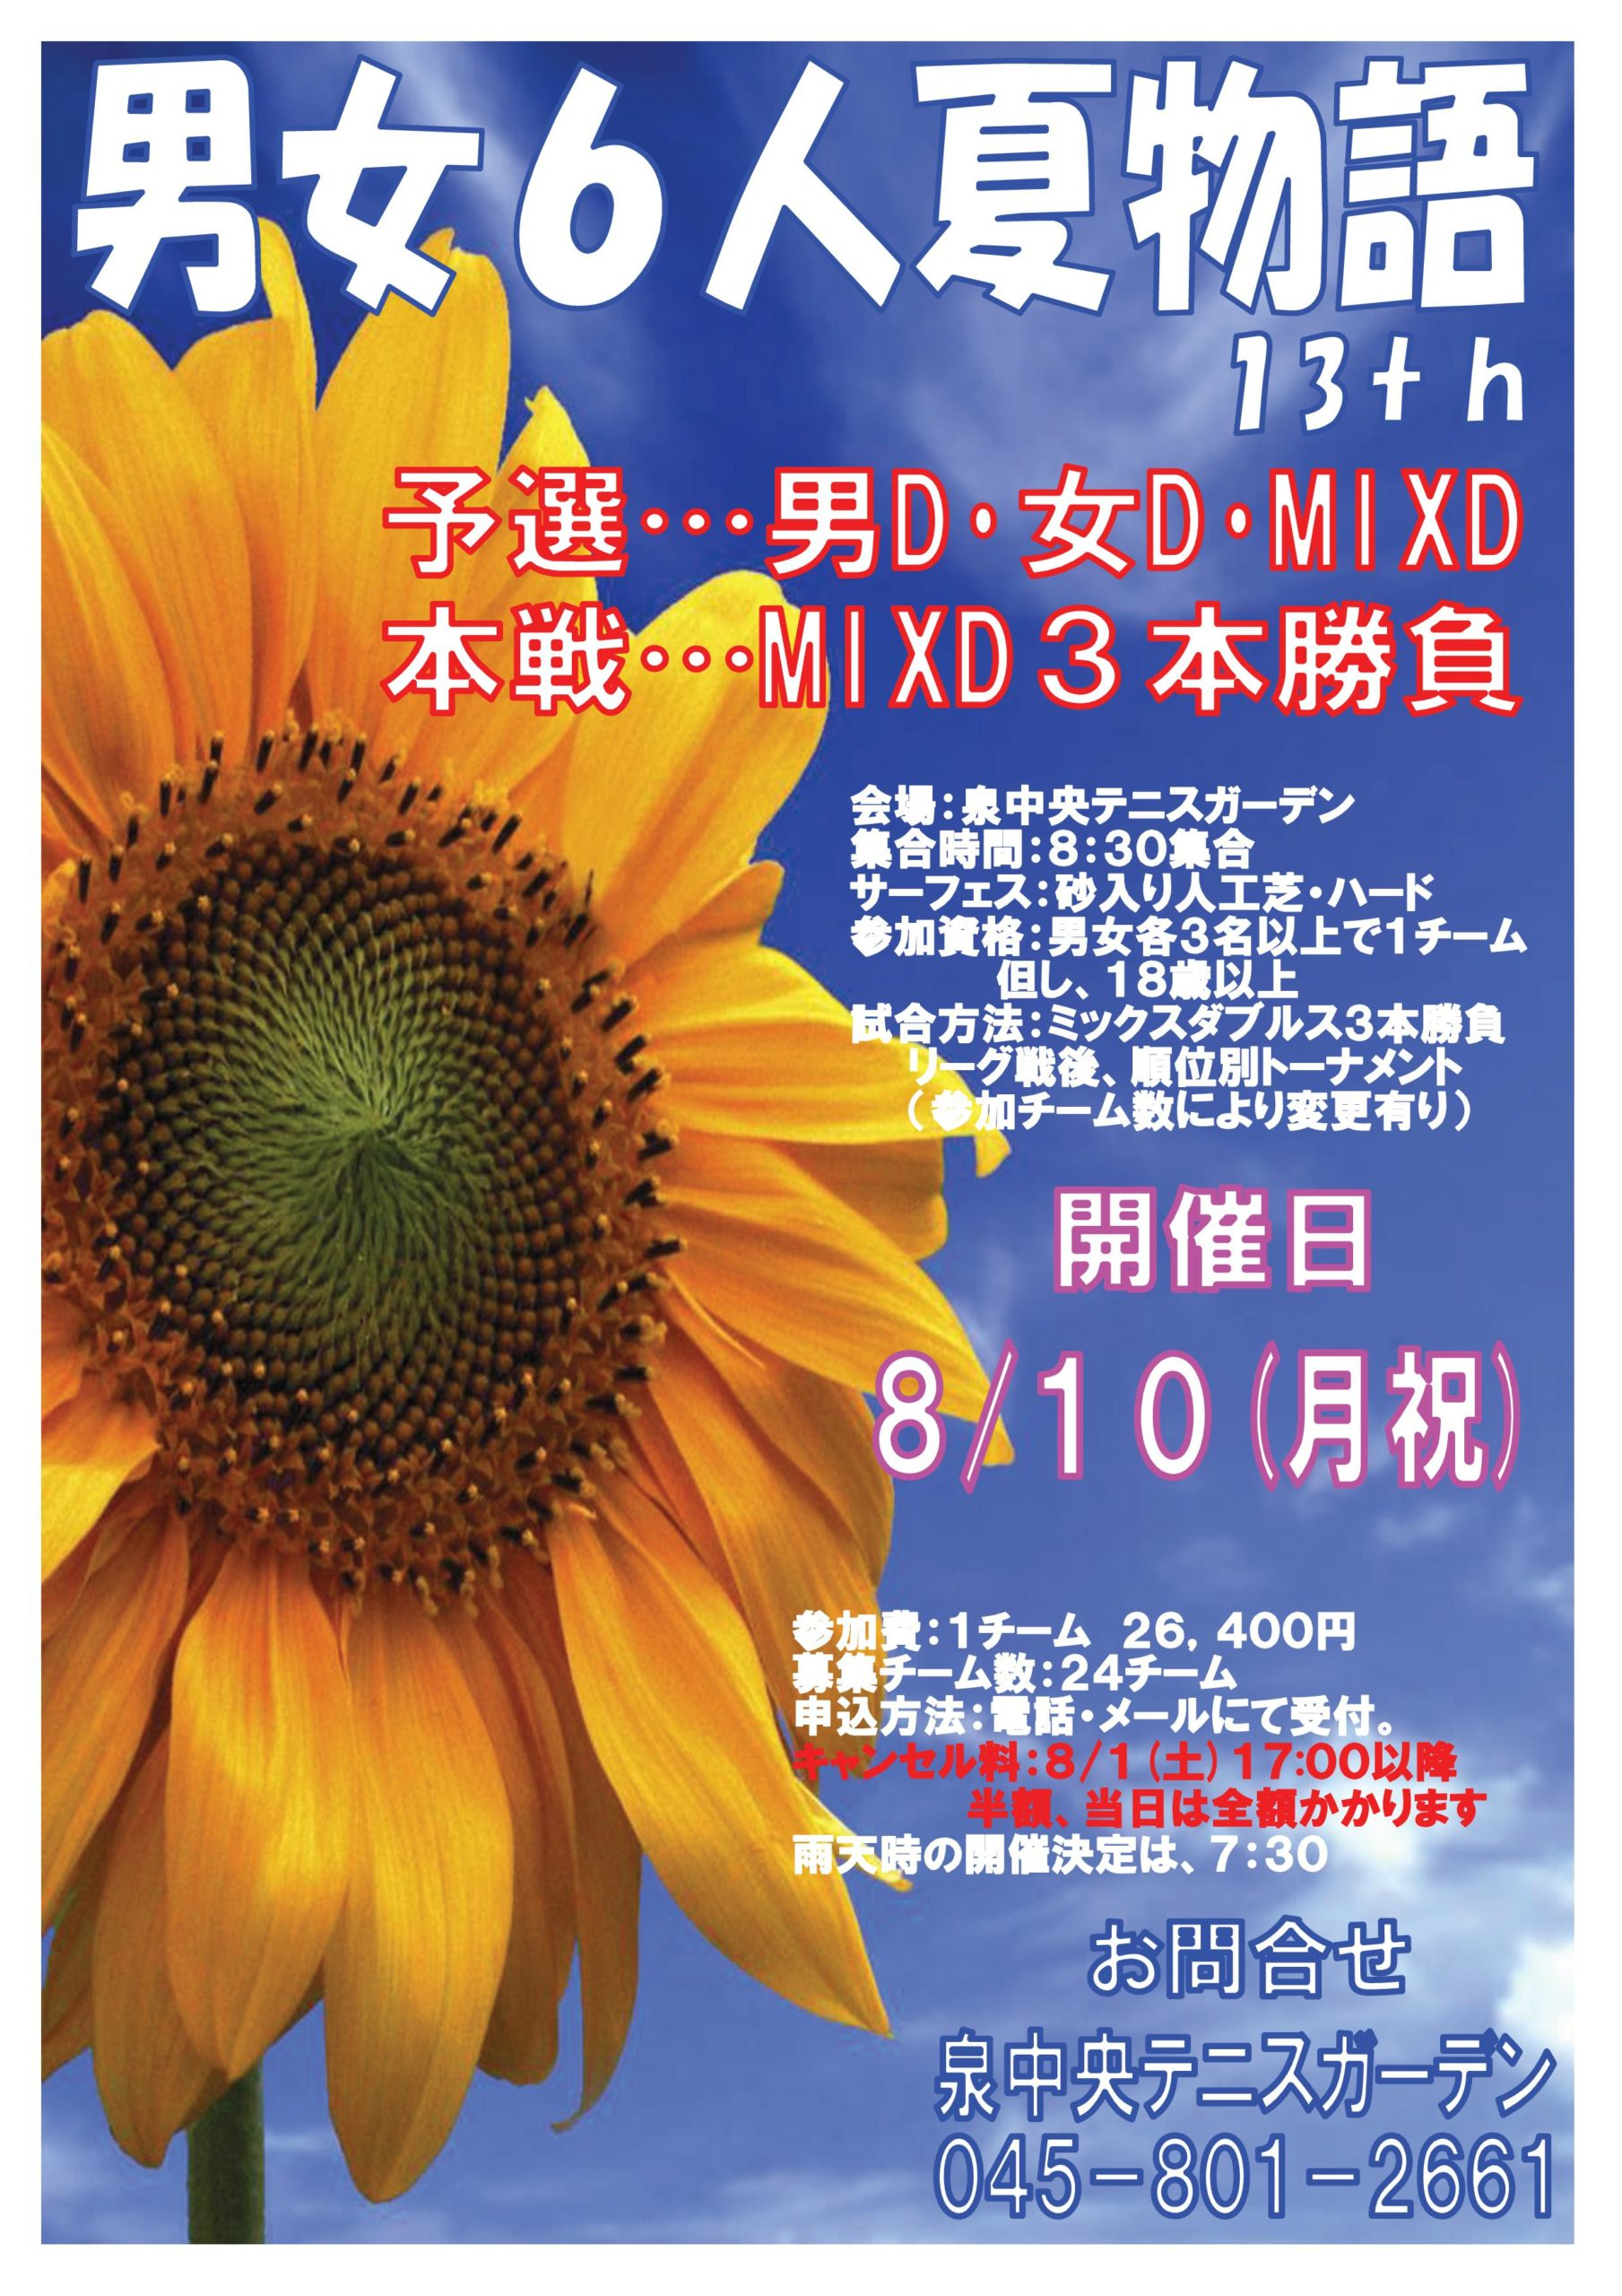 scaled - 2020年8月10日(月祝)男女6人夏物語